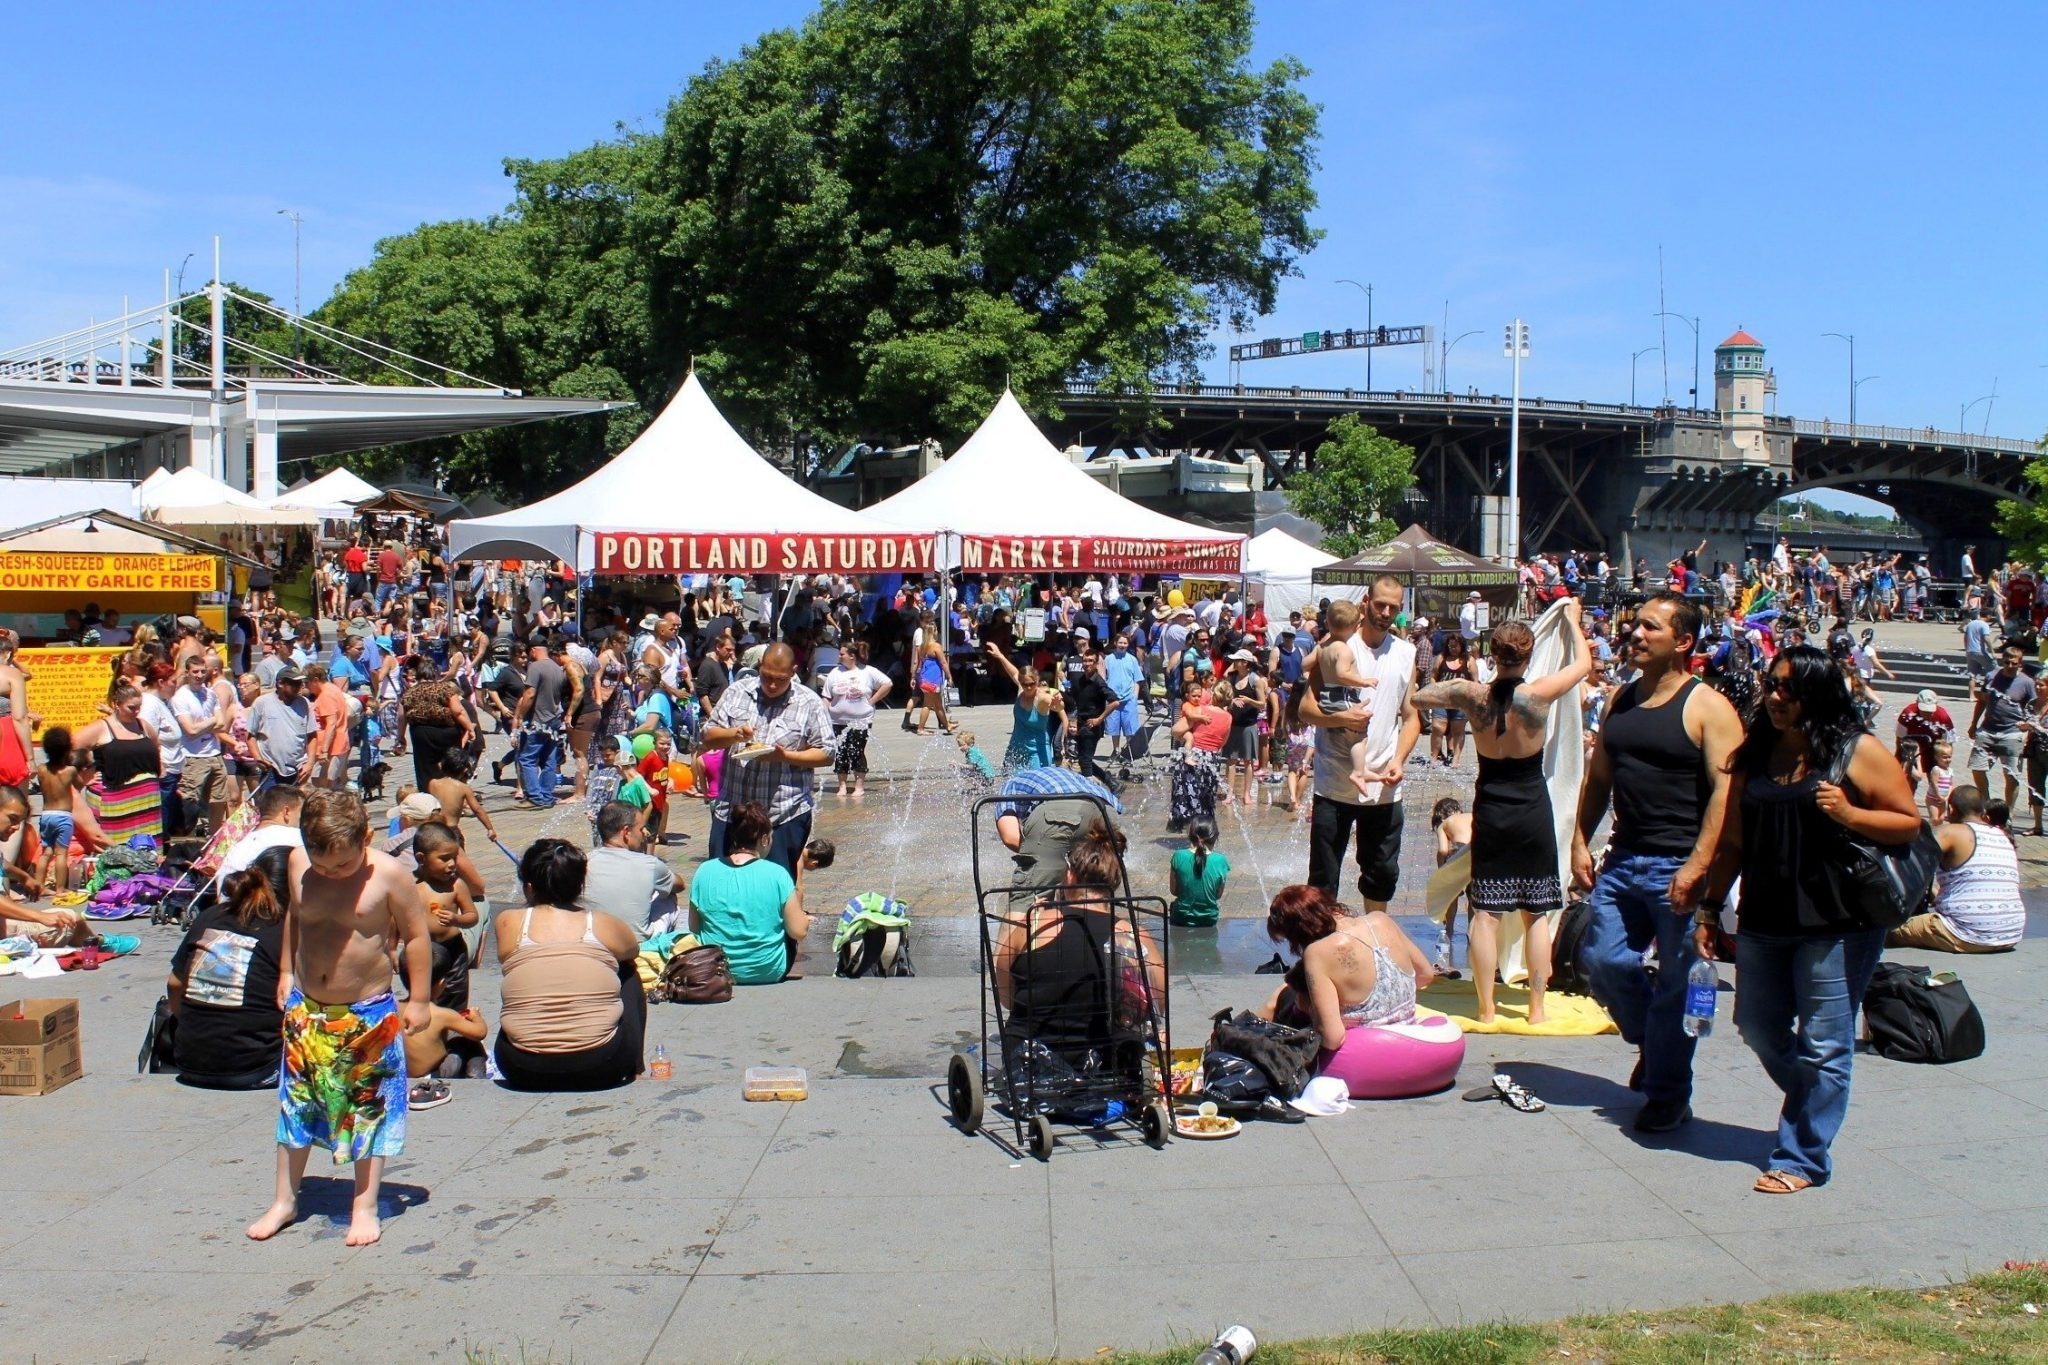 Portland Saturday Market - Oregon